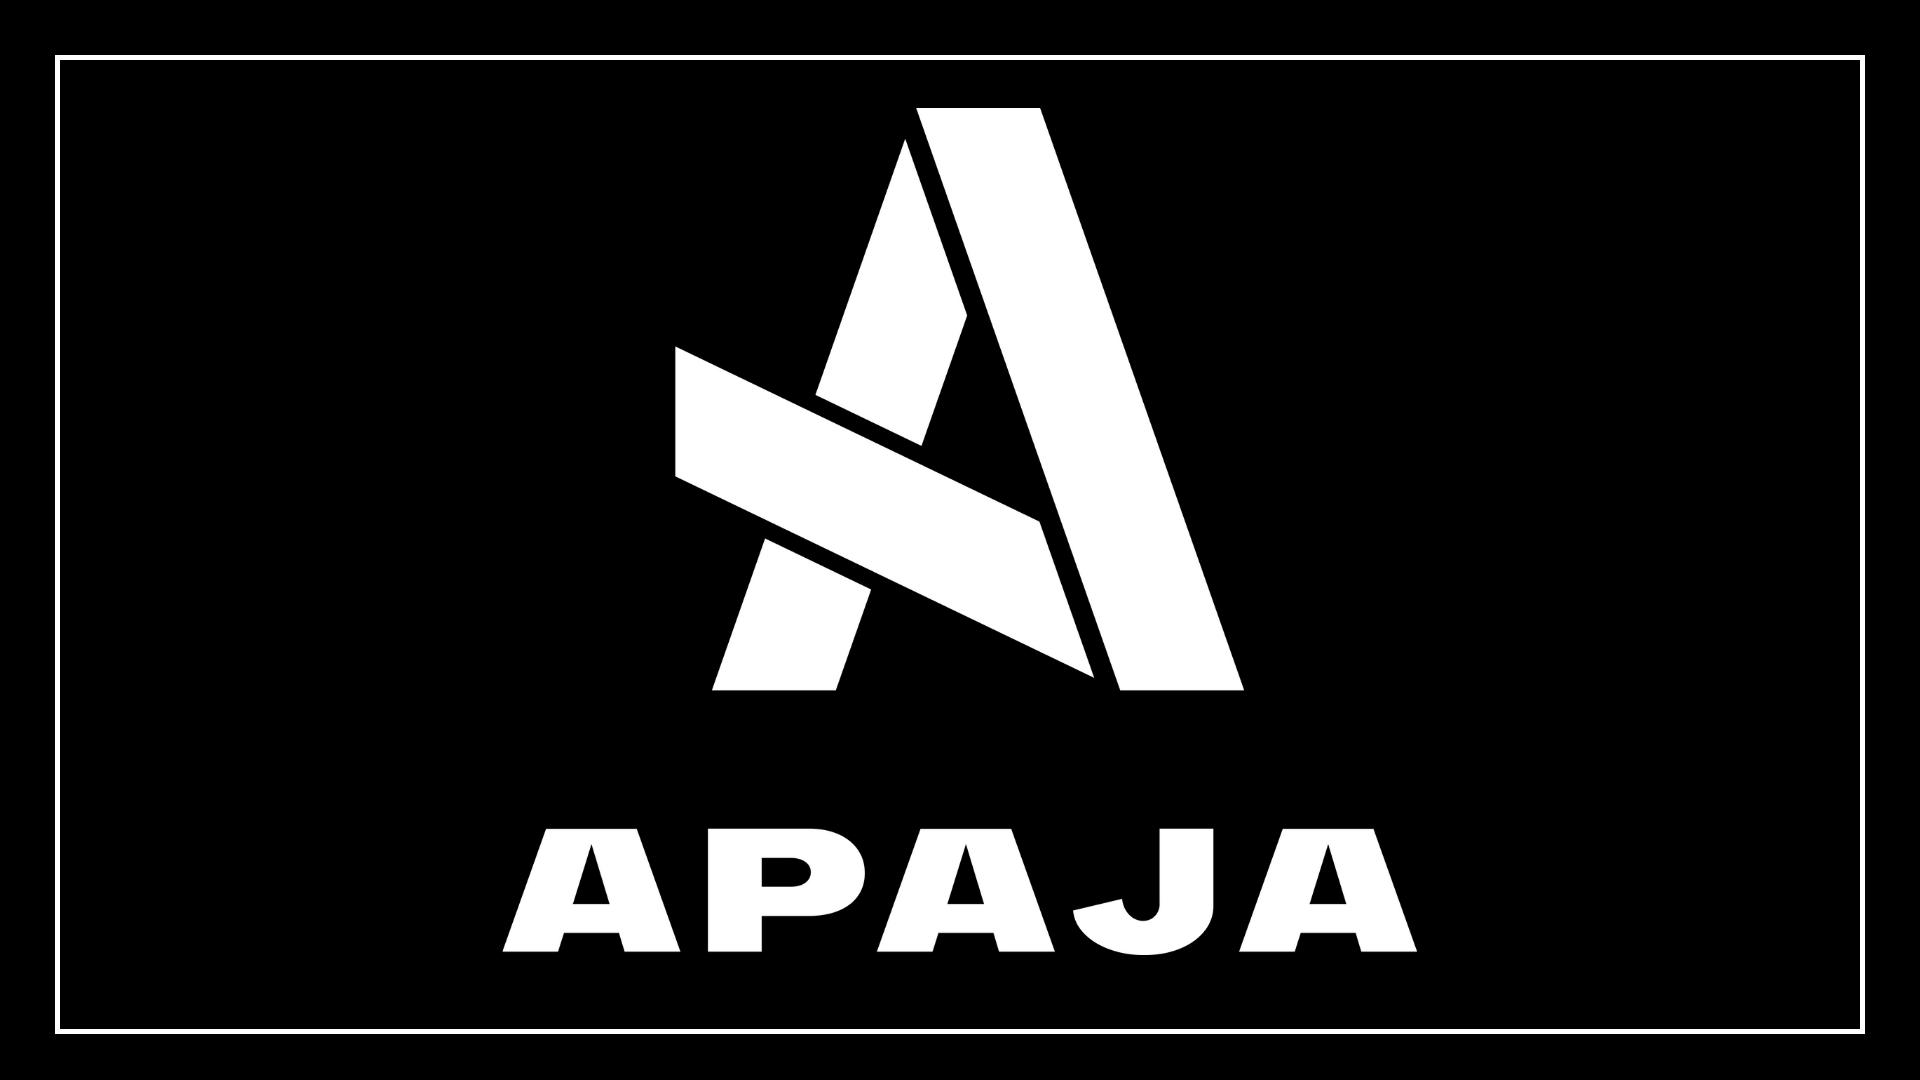 Apaja_logo